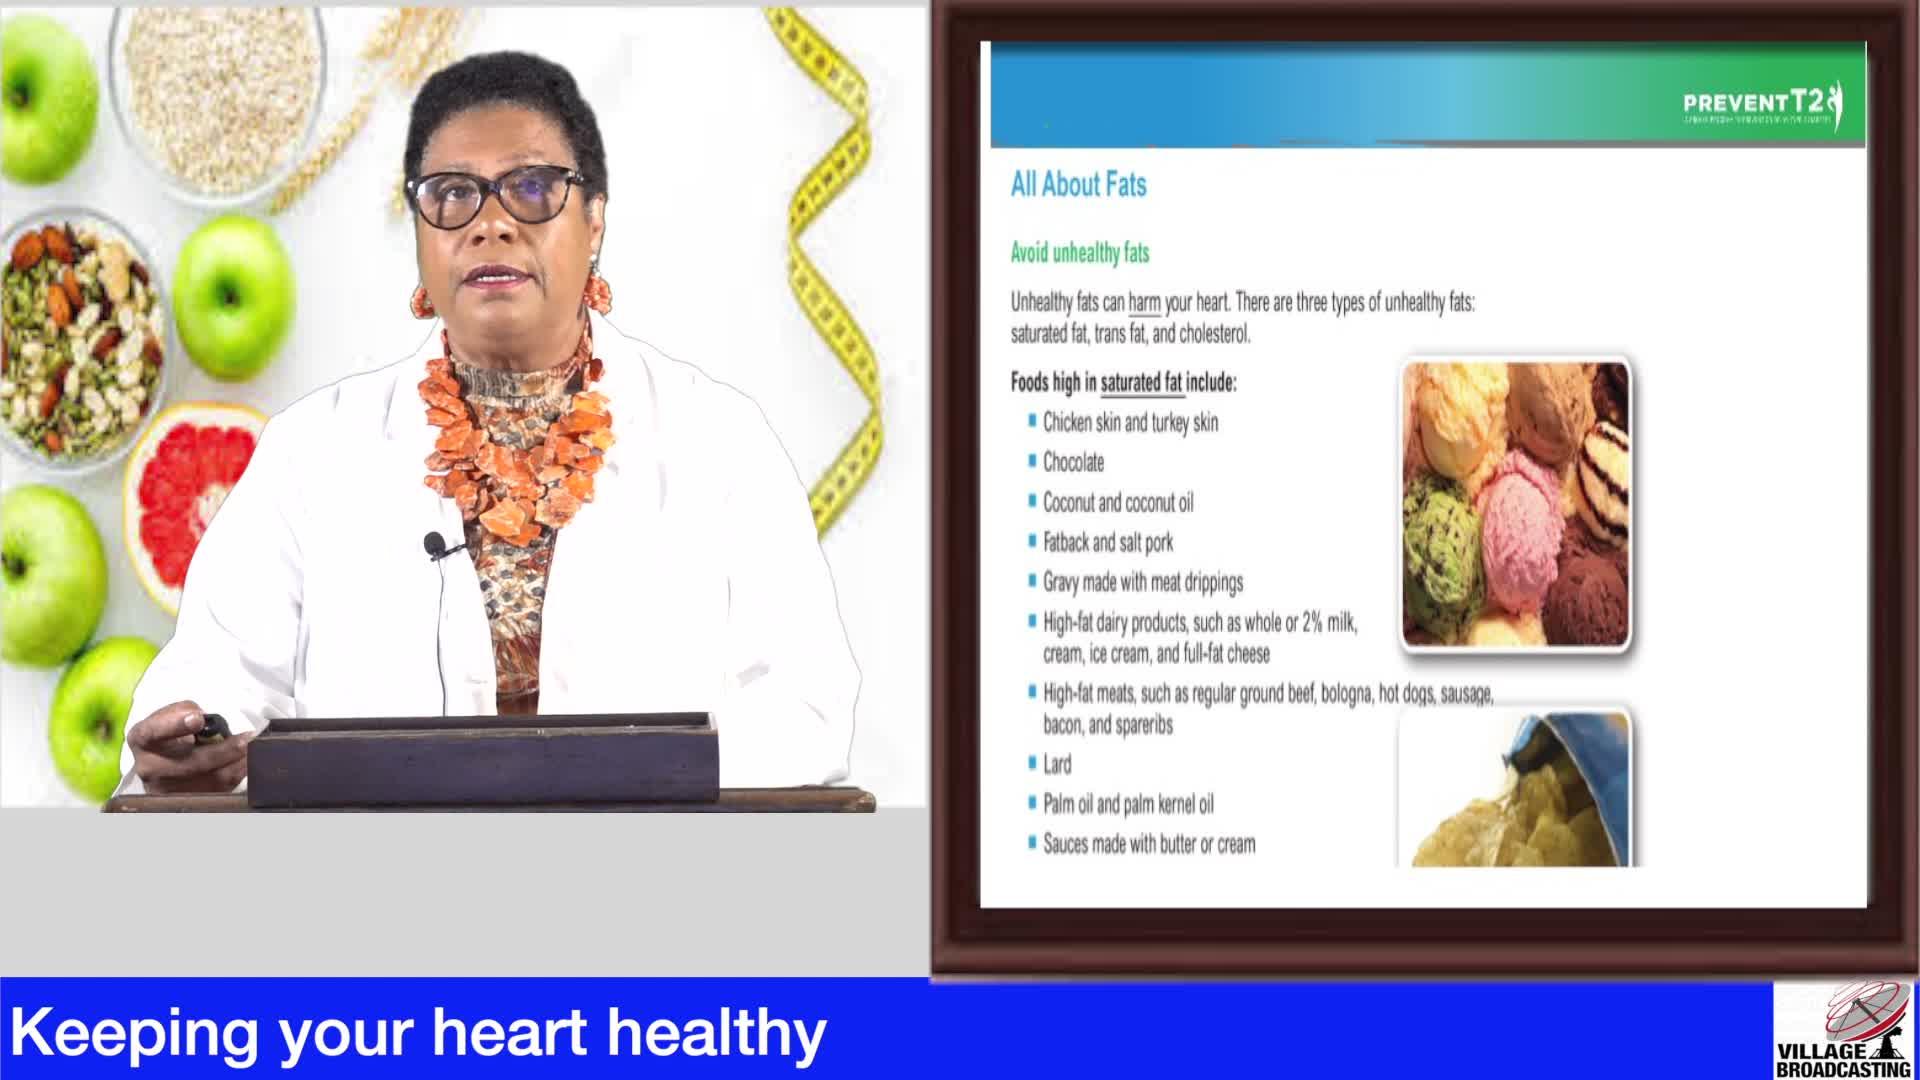 Keep Your Heart Healty 10-23-20